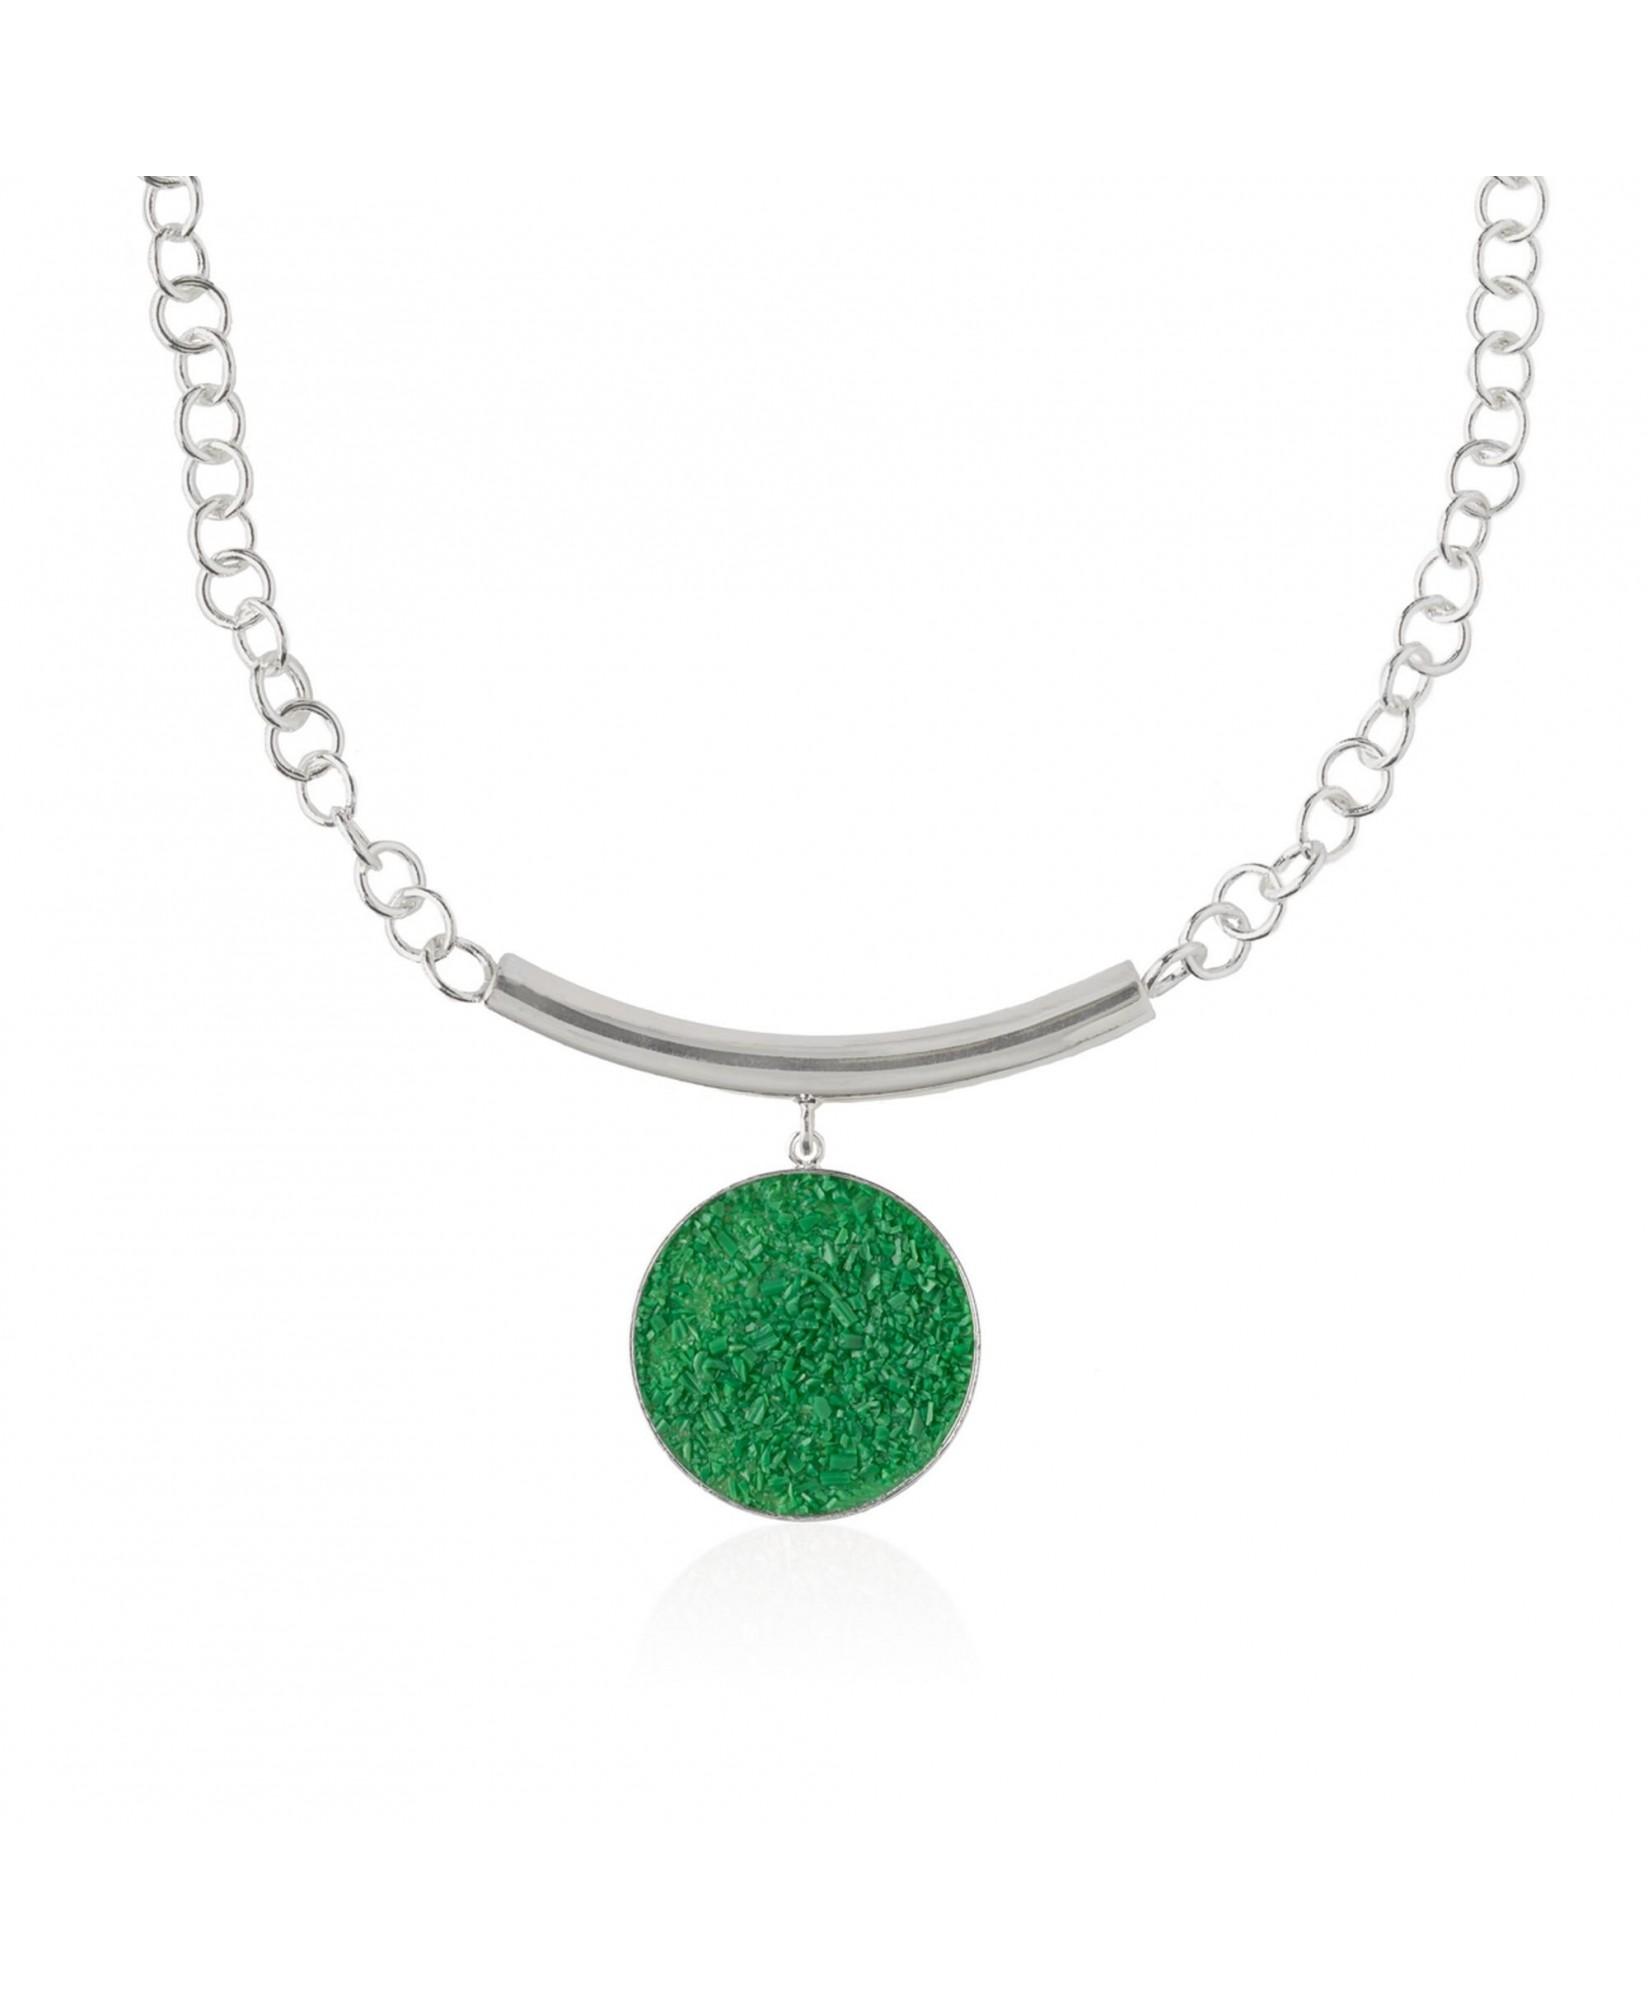 Collar de plata Demeter con colgante de nácar verde Collar de plata Demeter con colgante de nácar verde